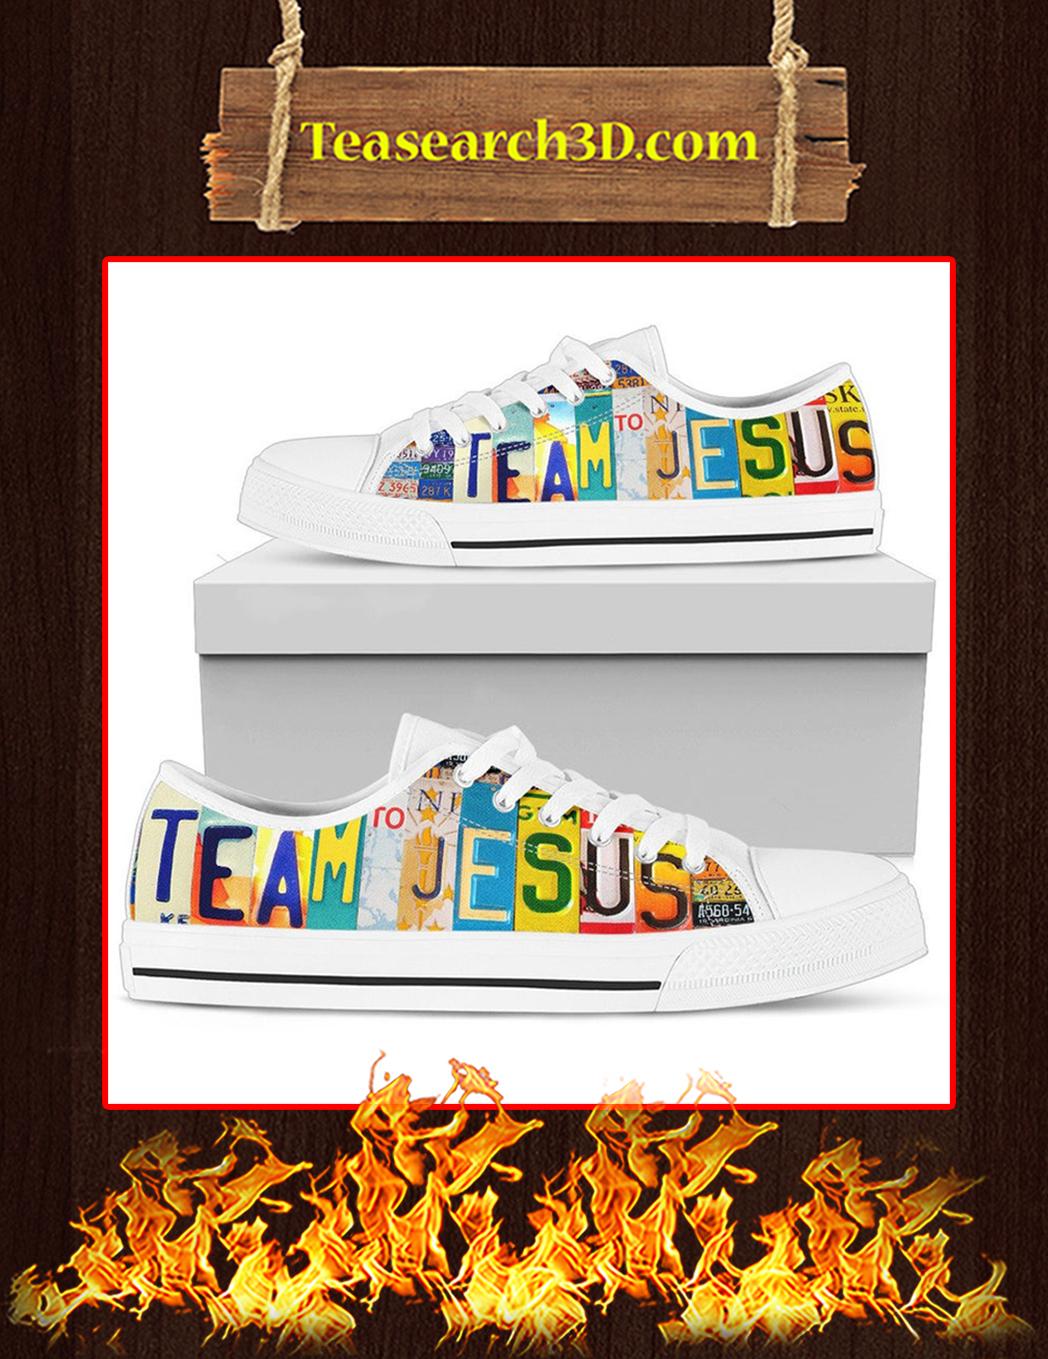 Team Jesus Low Top Shoes - Pic 1